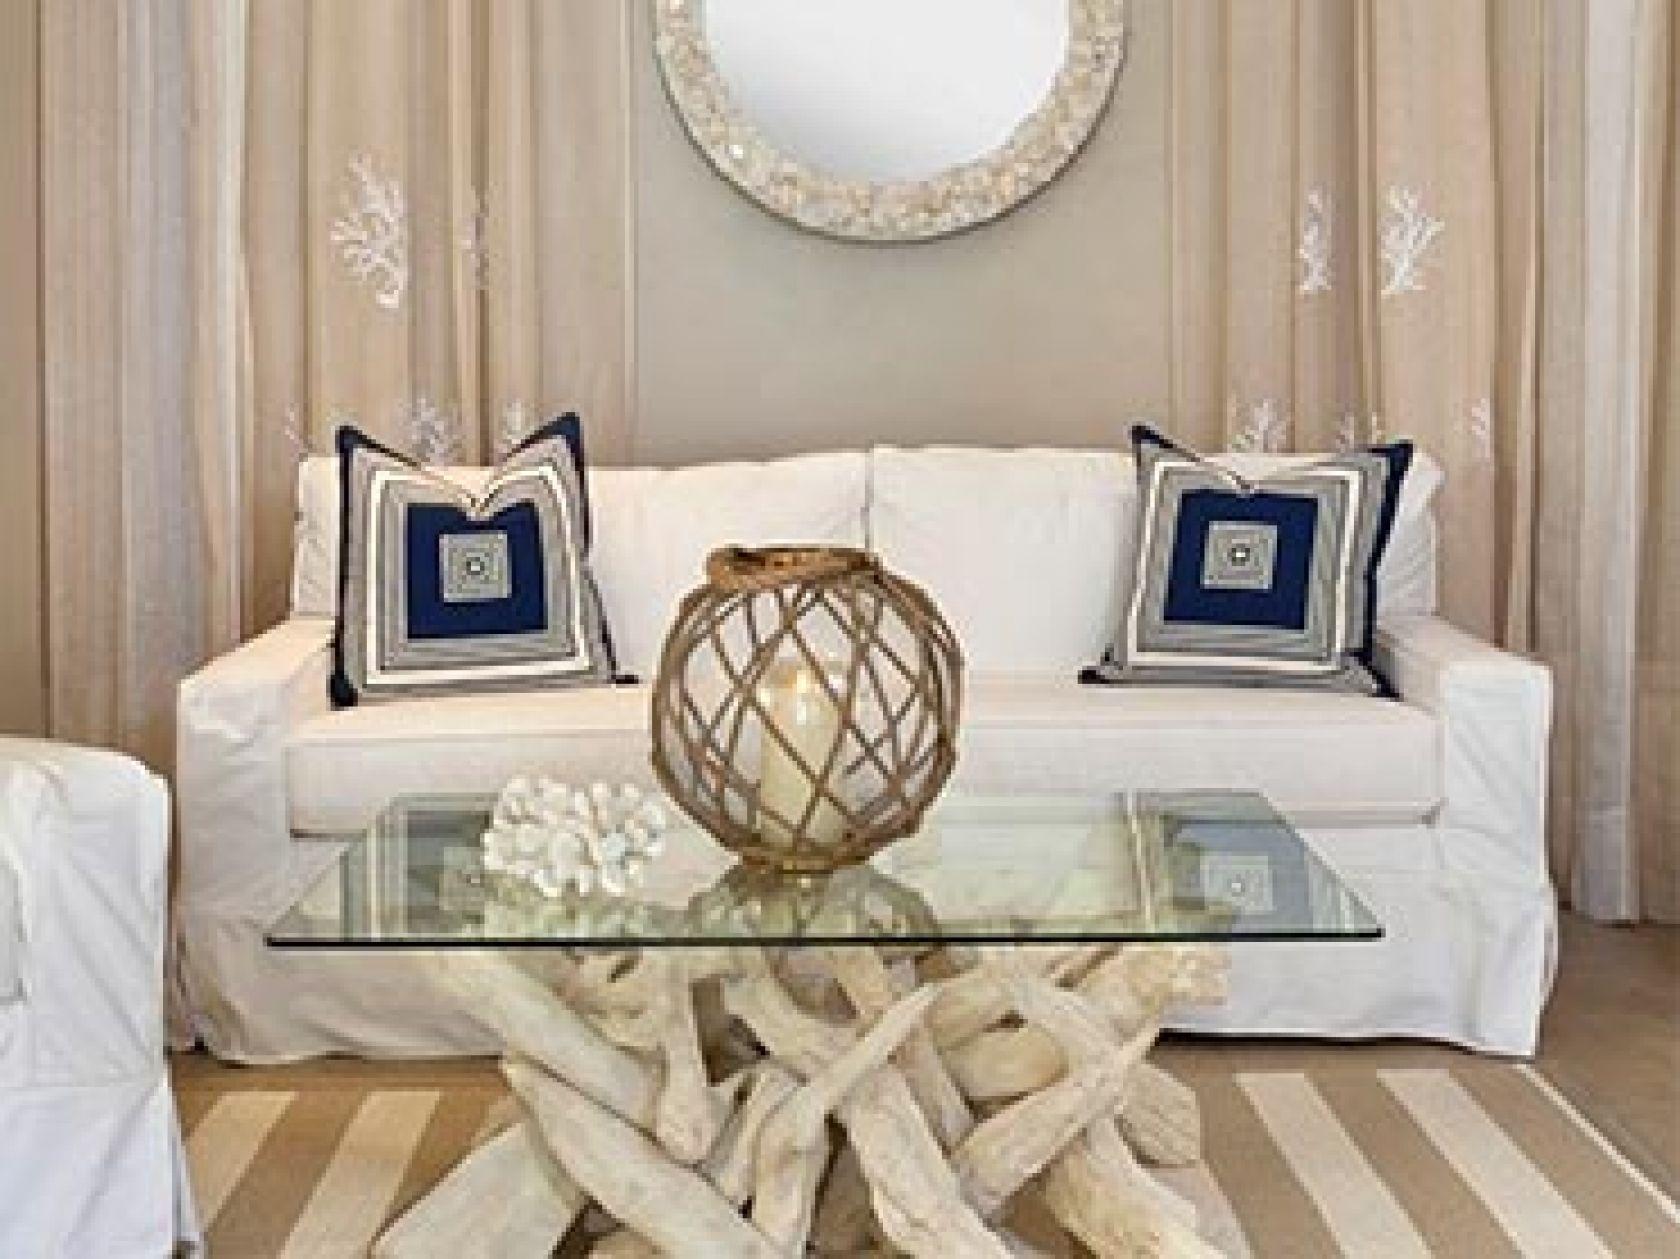 Nautical Inspired Furniture. Coastal Home Furniture, Nautical Decor, \u0026  Lighting For Beach